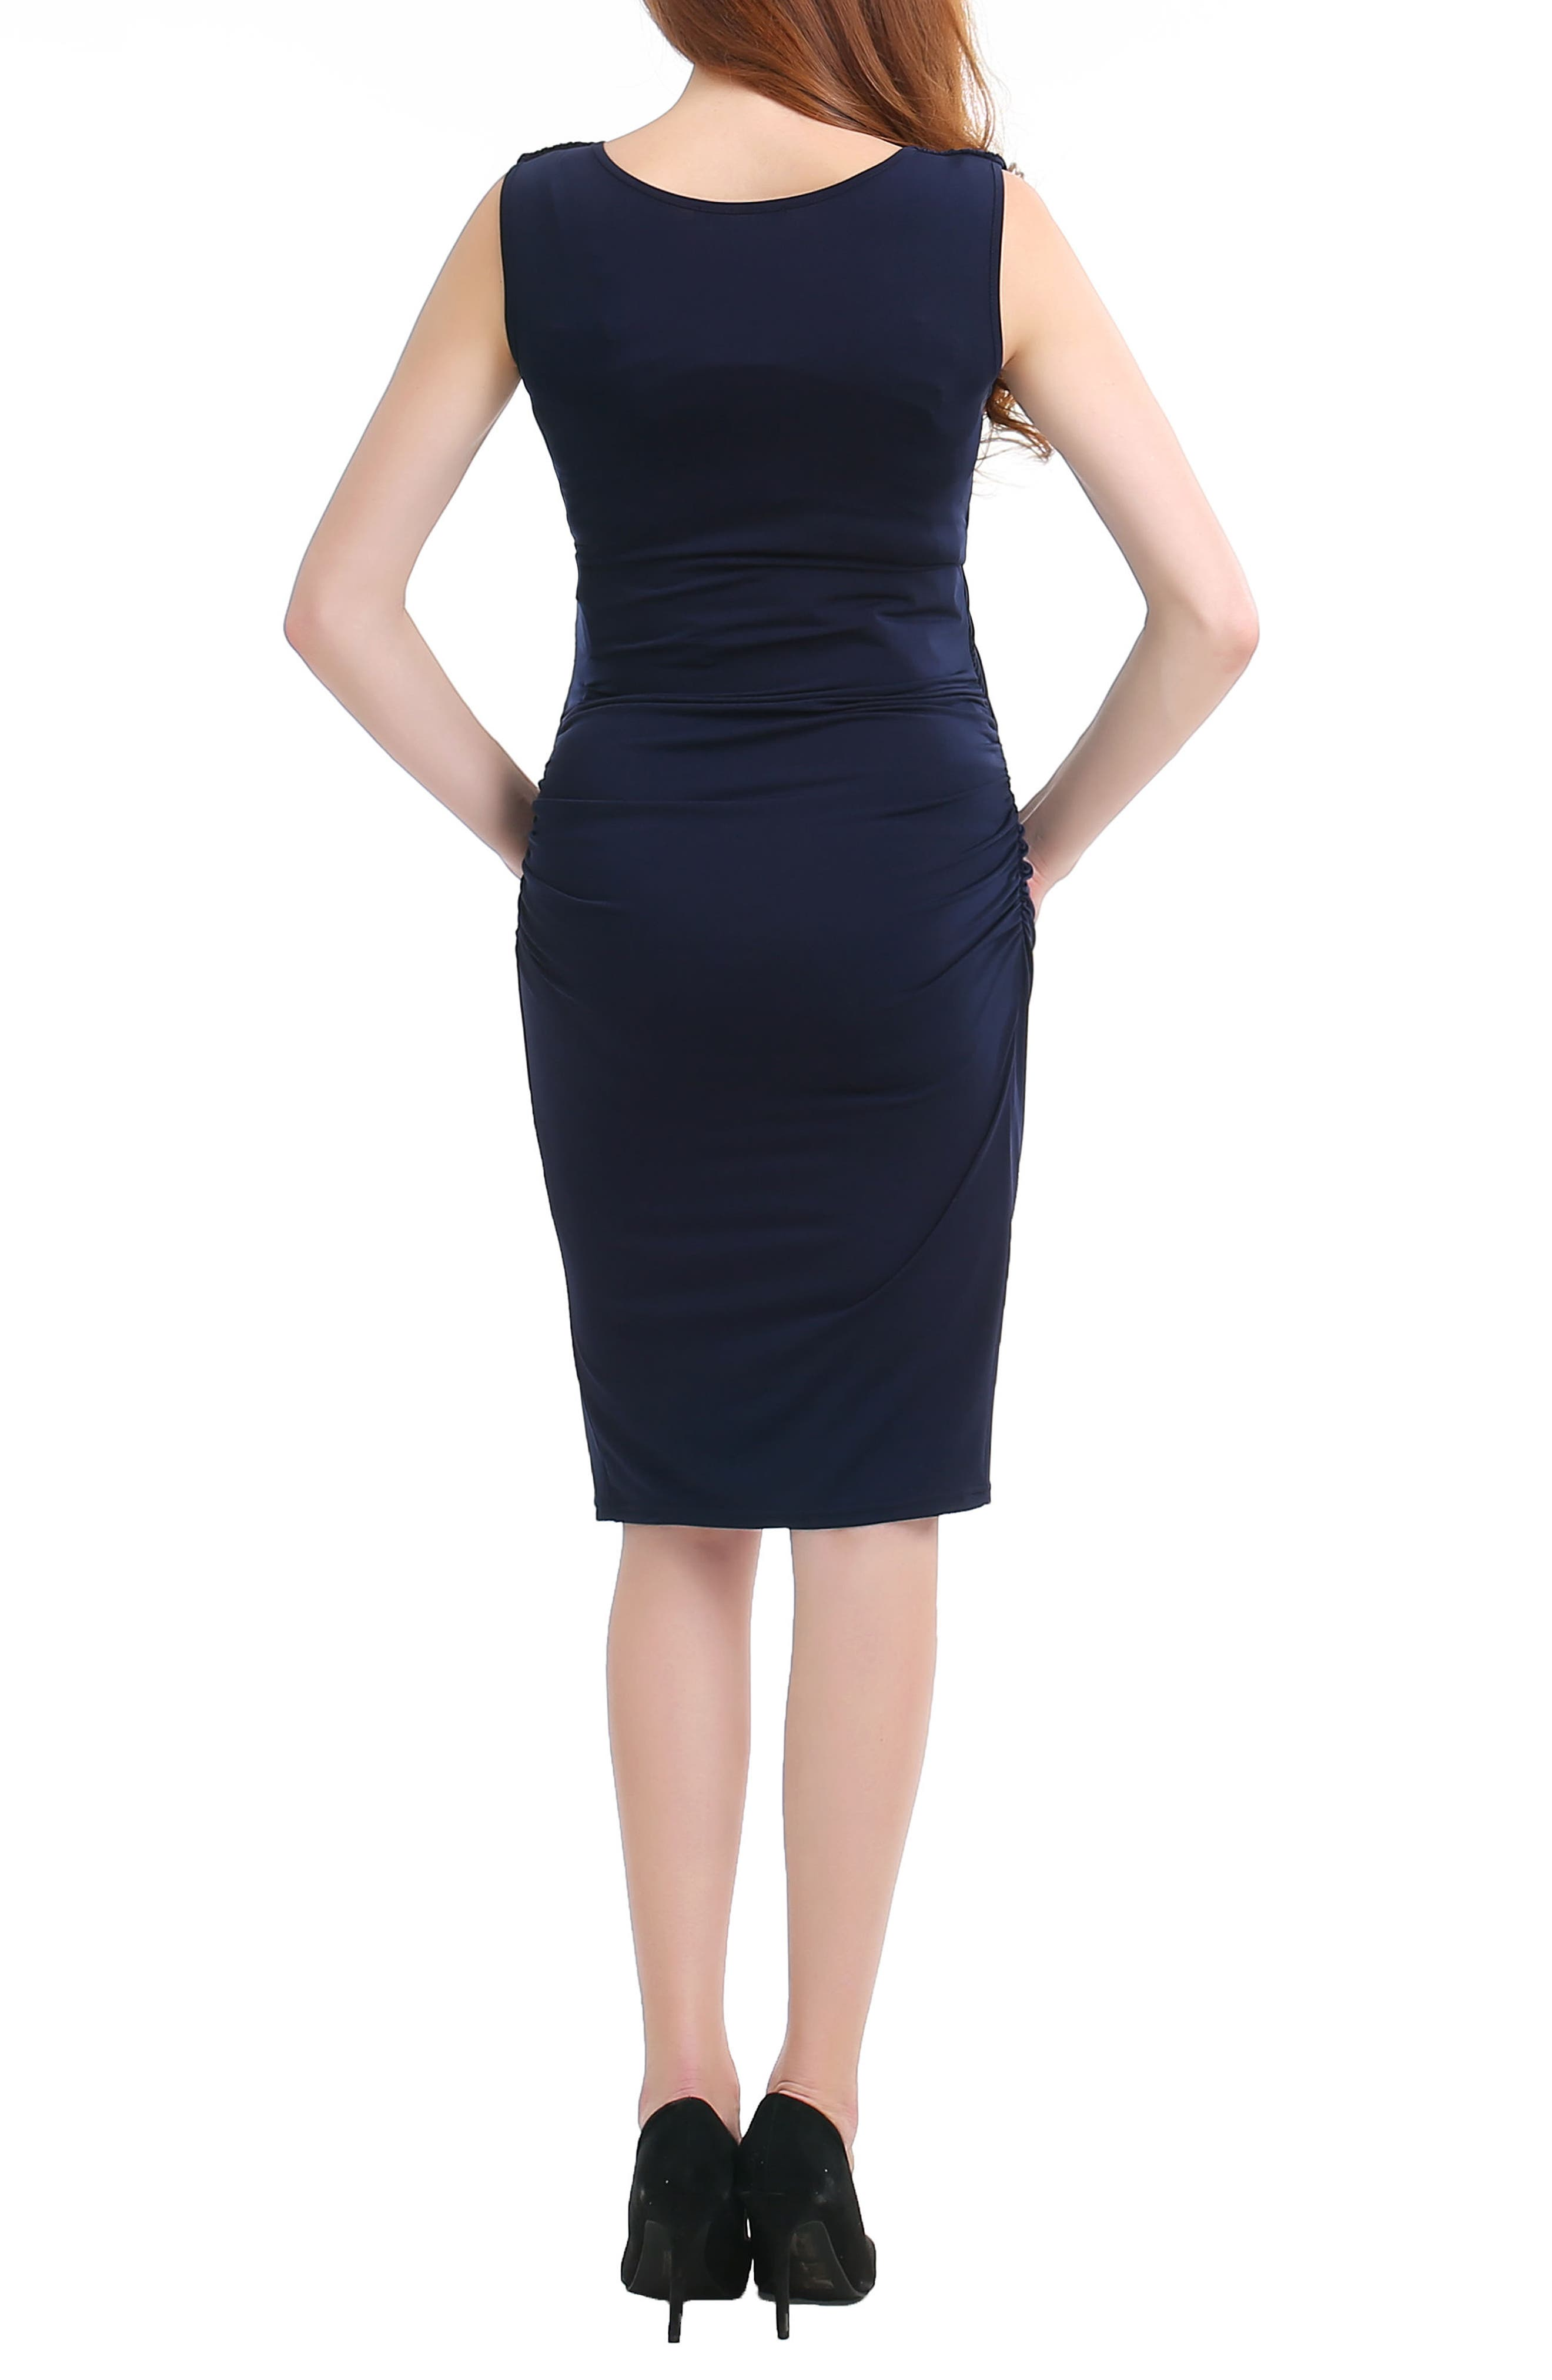 Bonnie Wrap Maternity Dress,                             Alternate thumbnail 4, color,